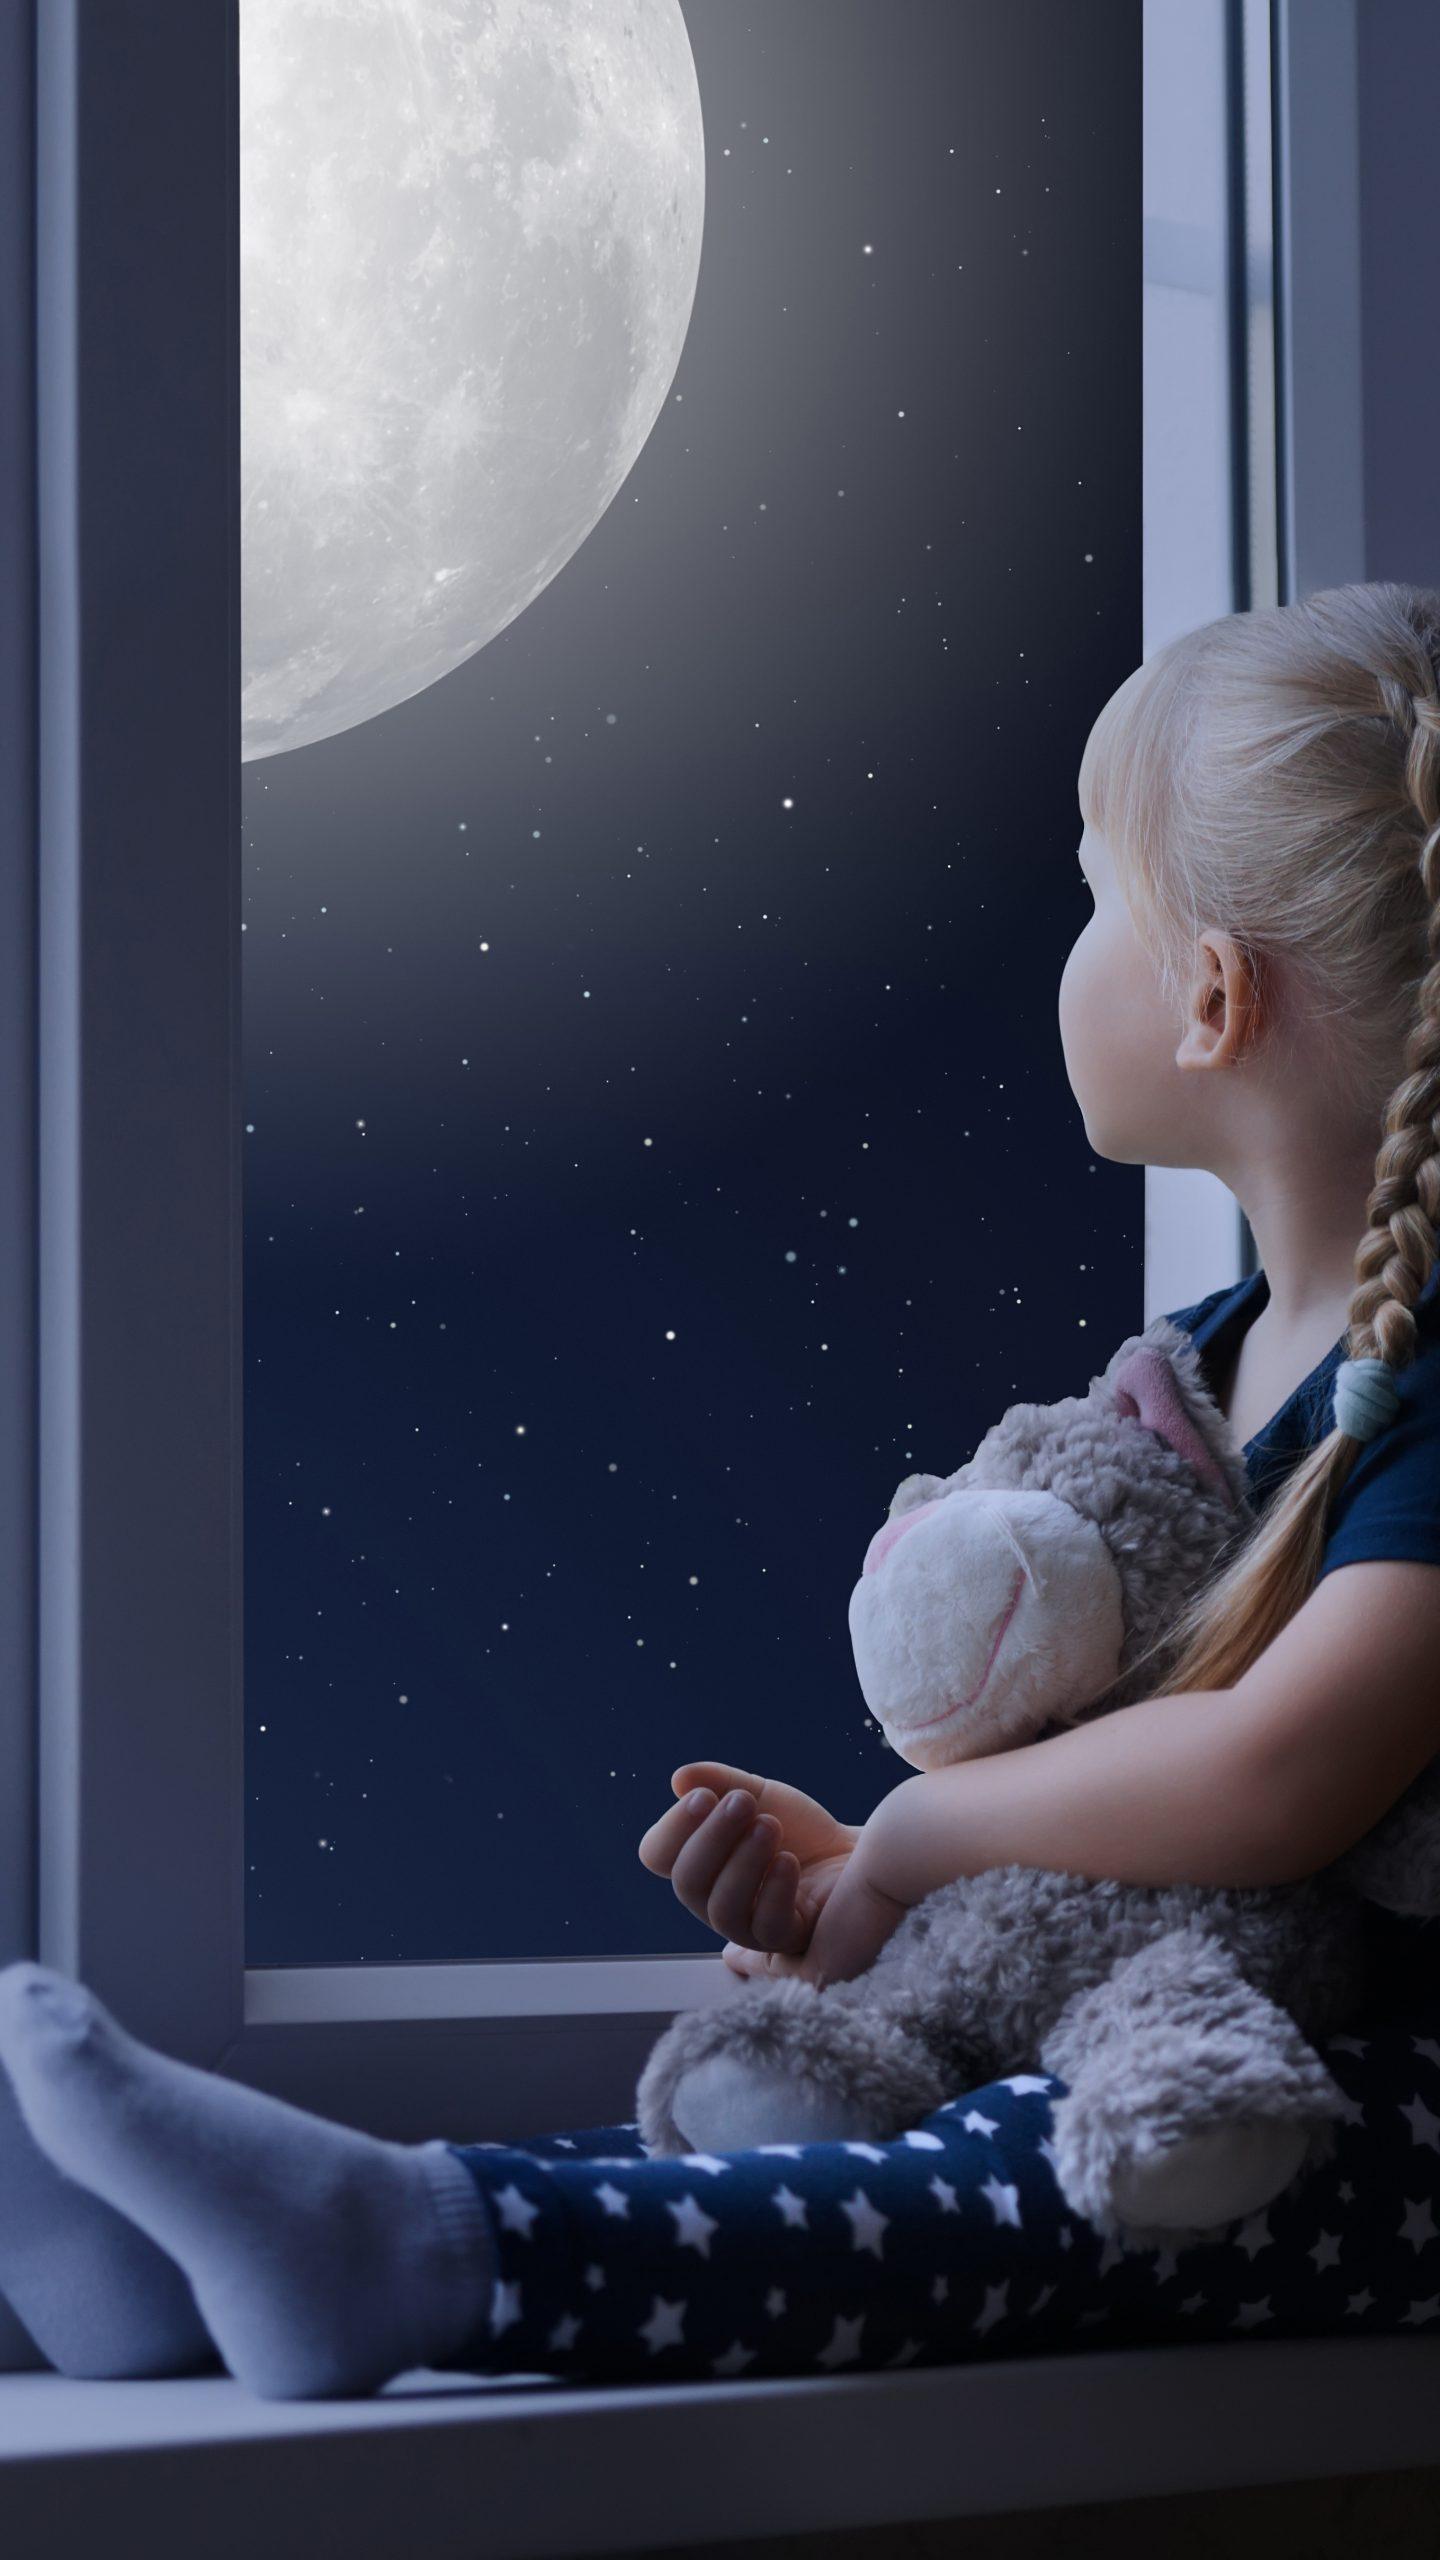 Little Girl Sad Window Teddybear Night Moon 8k Wallpaper